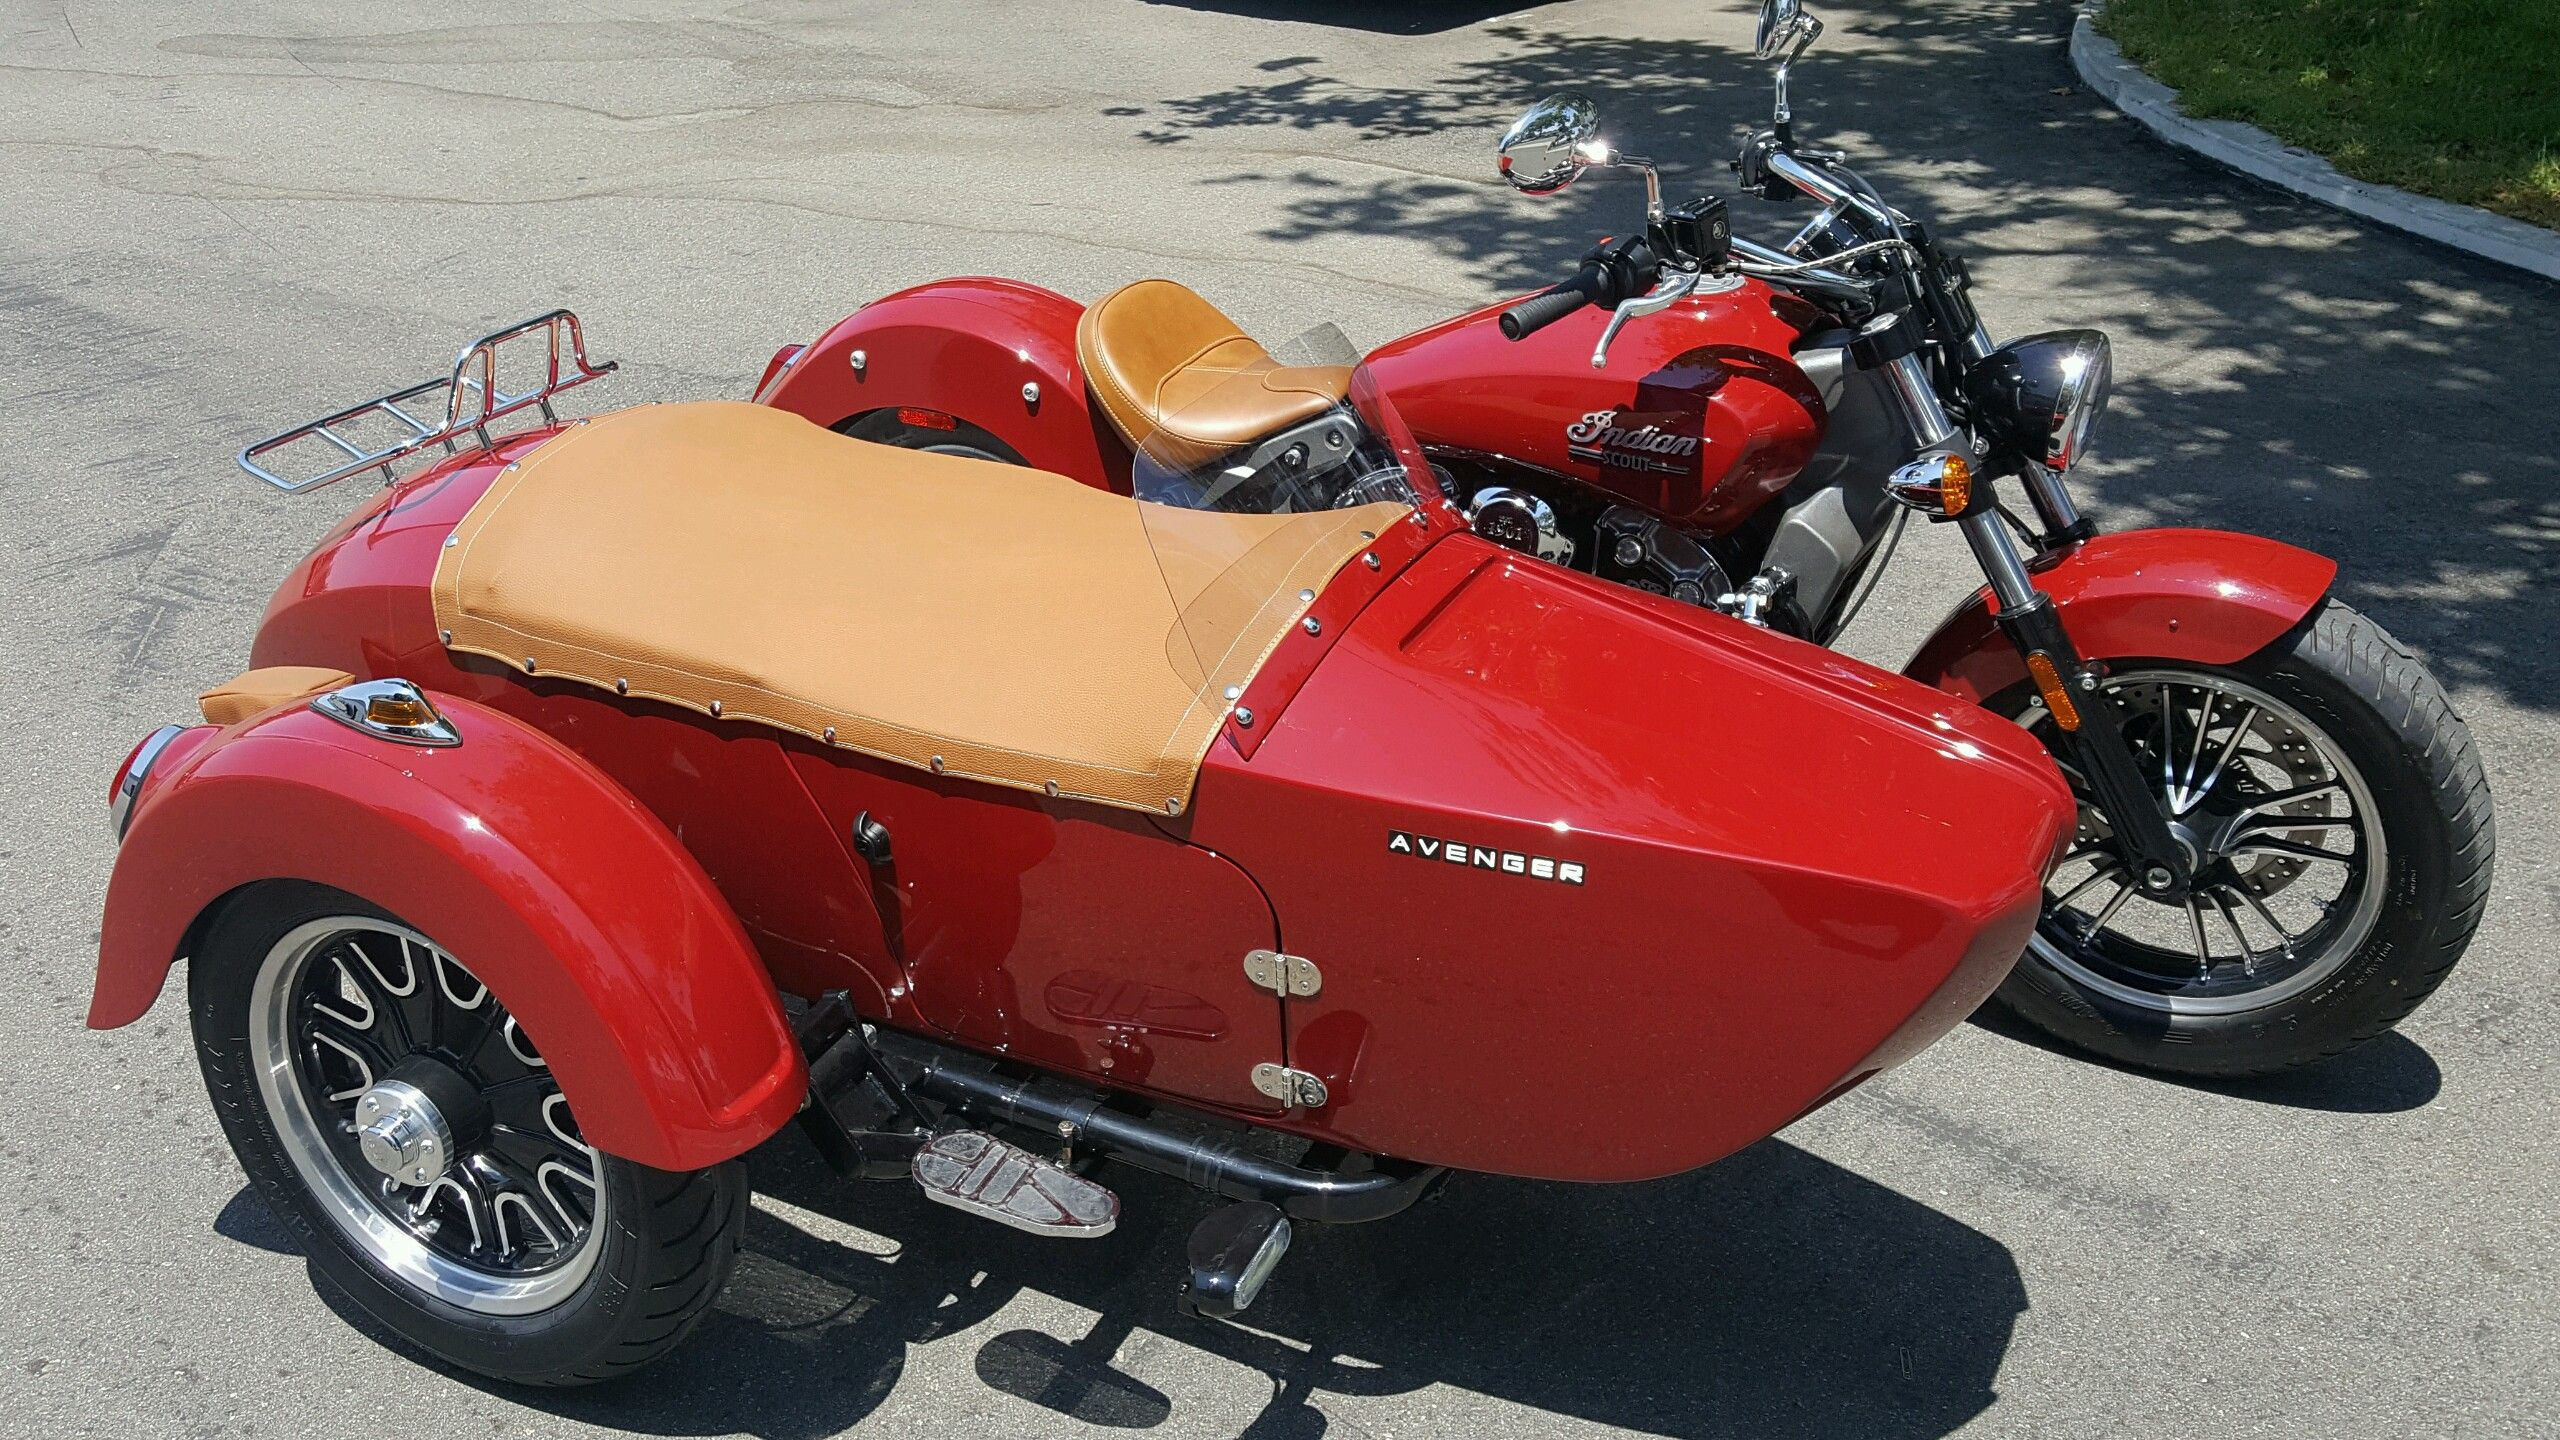 Avenger sidecar image motorcycle sidecar sidecar